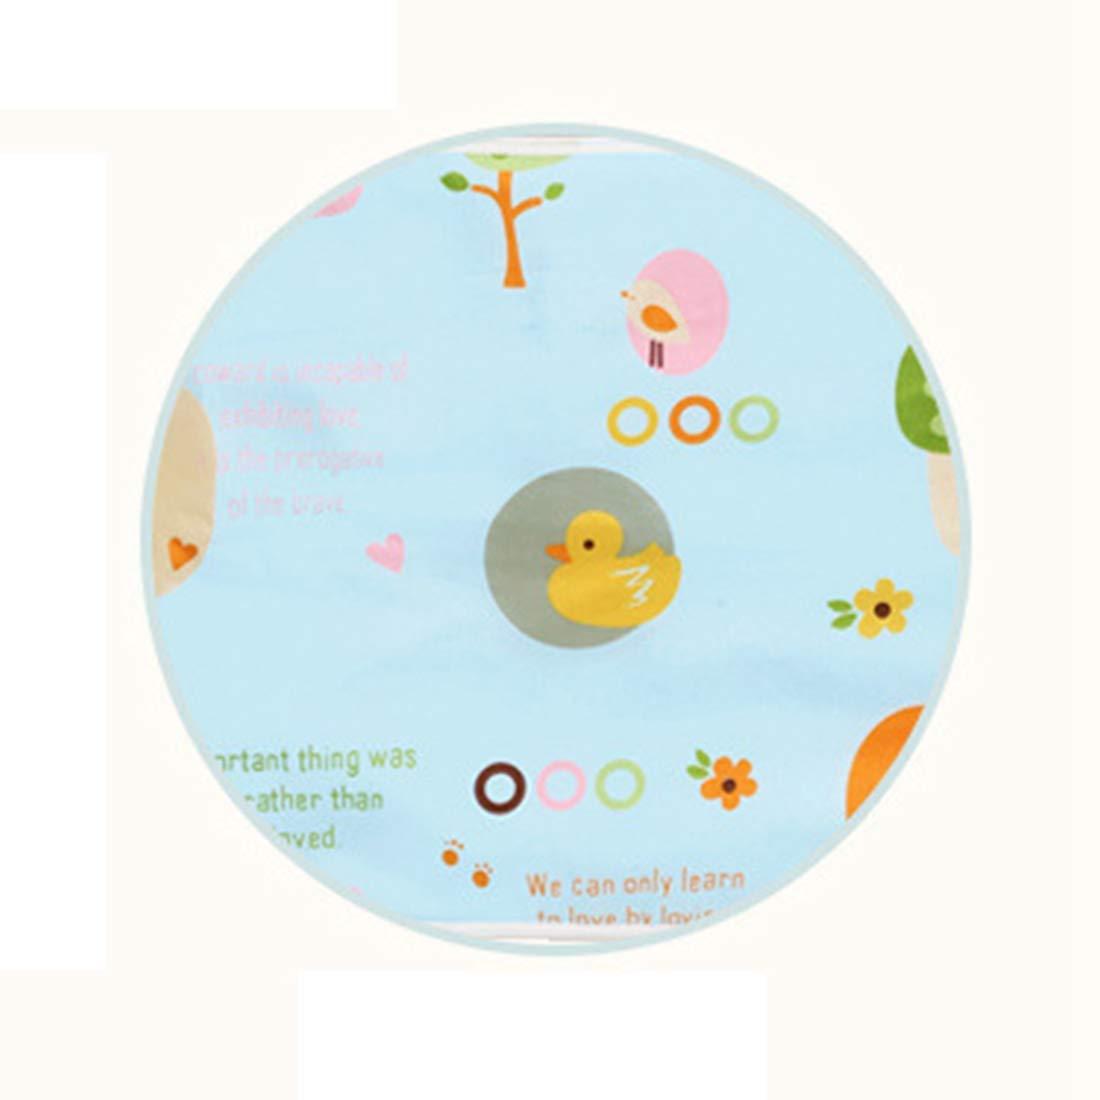 Pinji Cambiar pa/ñales para beb/és y ni/ños peque/ños impermeable reutilizable dise/ño de estrellas # 1 lavable